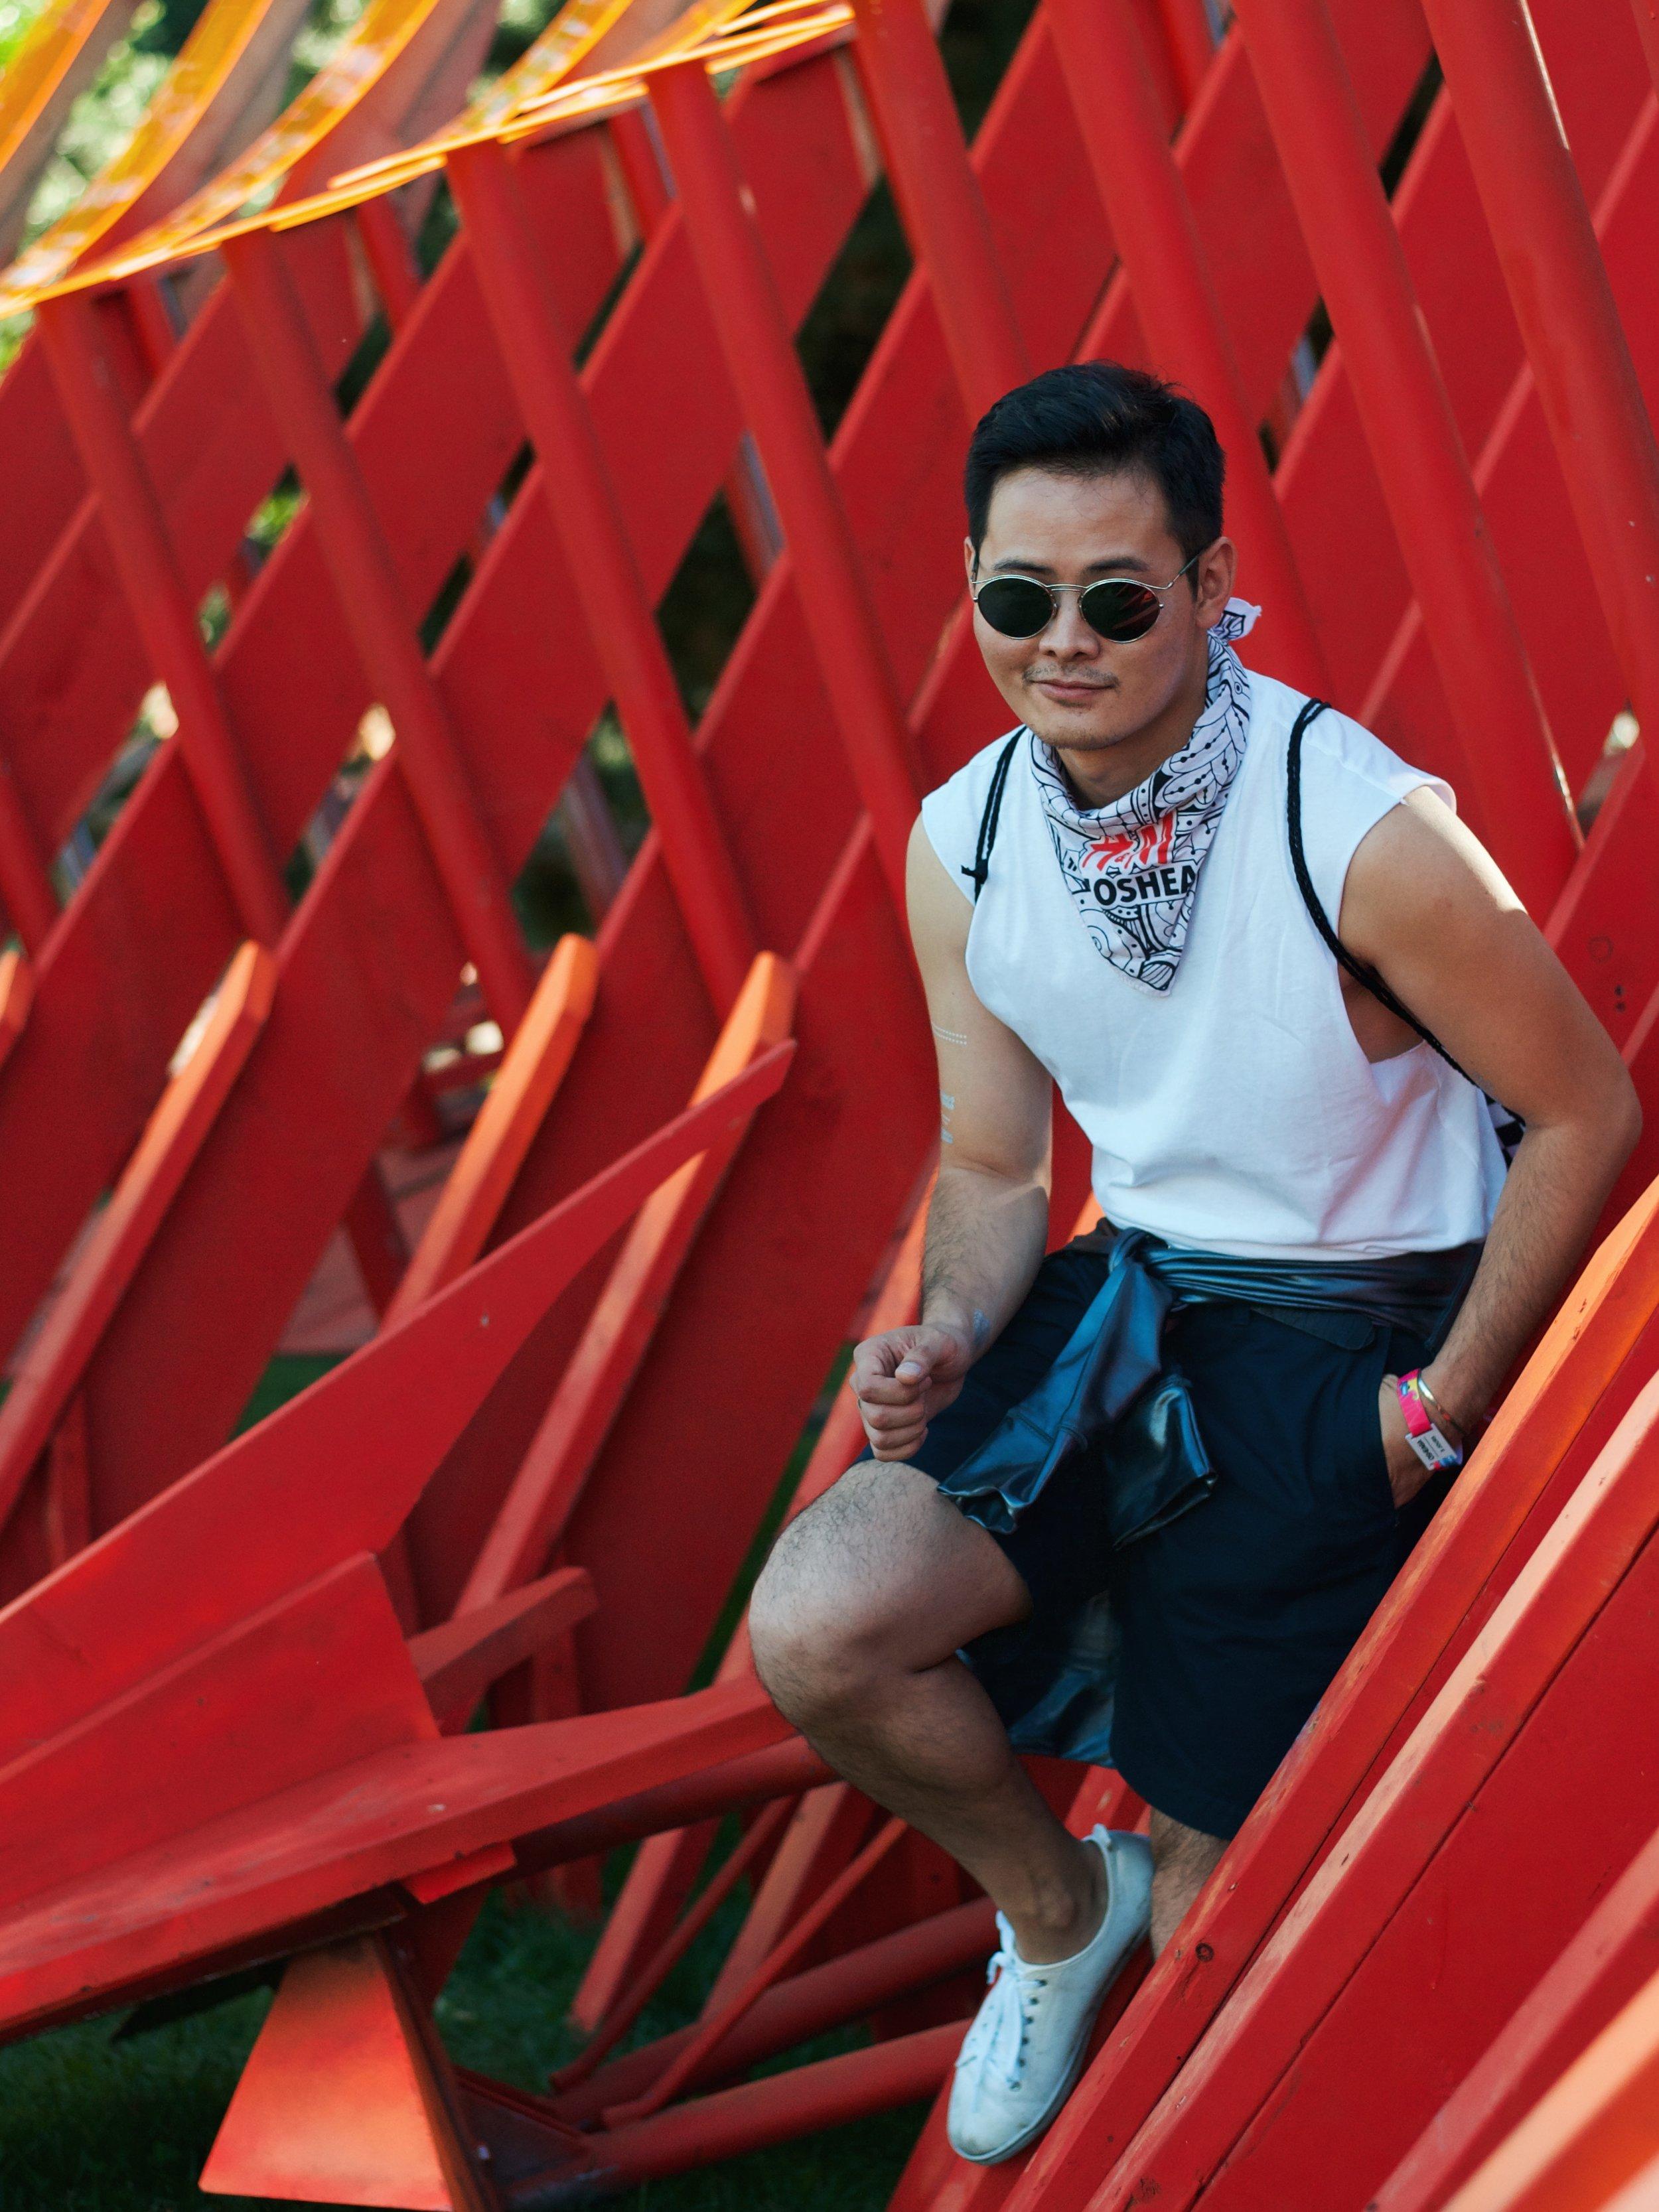 Osheaga menswear fashion H&M tank top festival outfit